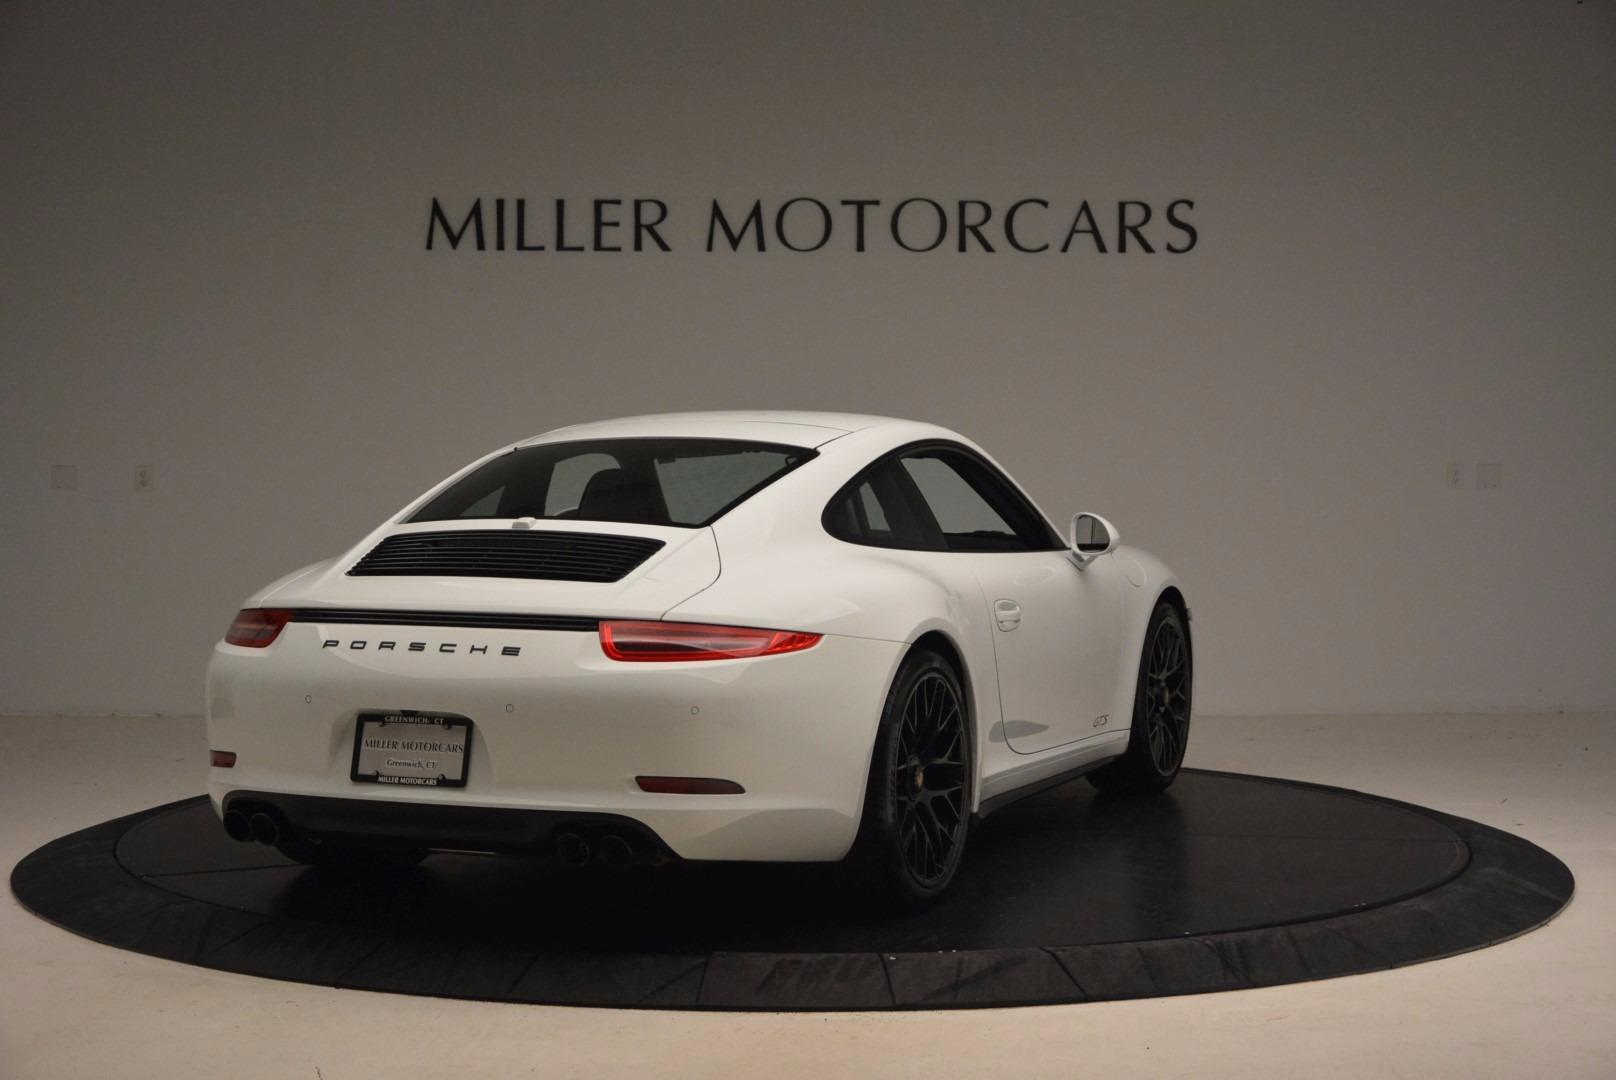 Used 2015 Porsche 911 Carrera GTS For Sale In Greenwich, CT 1444_p7